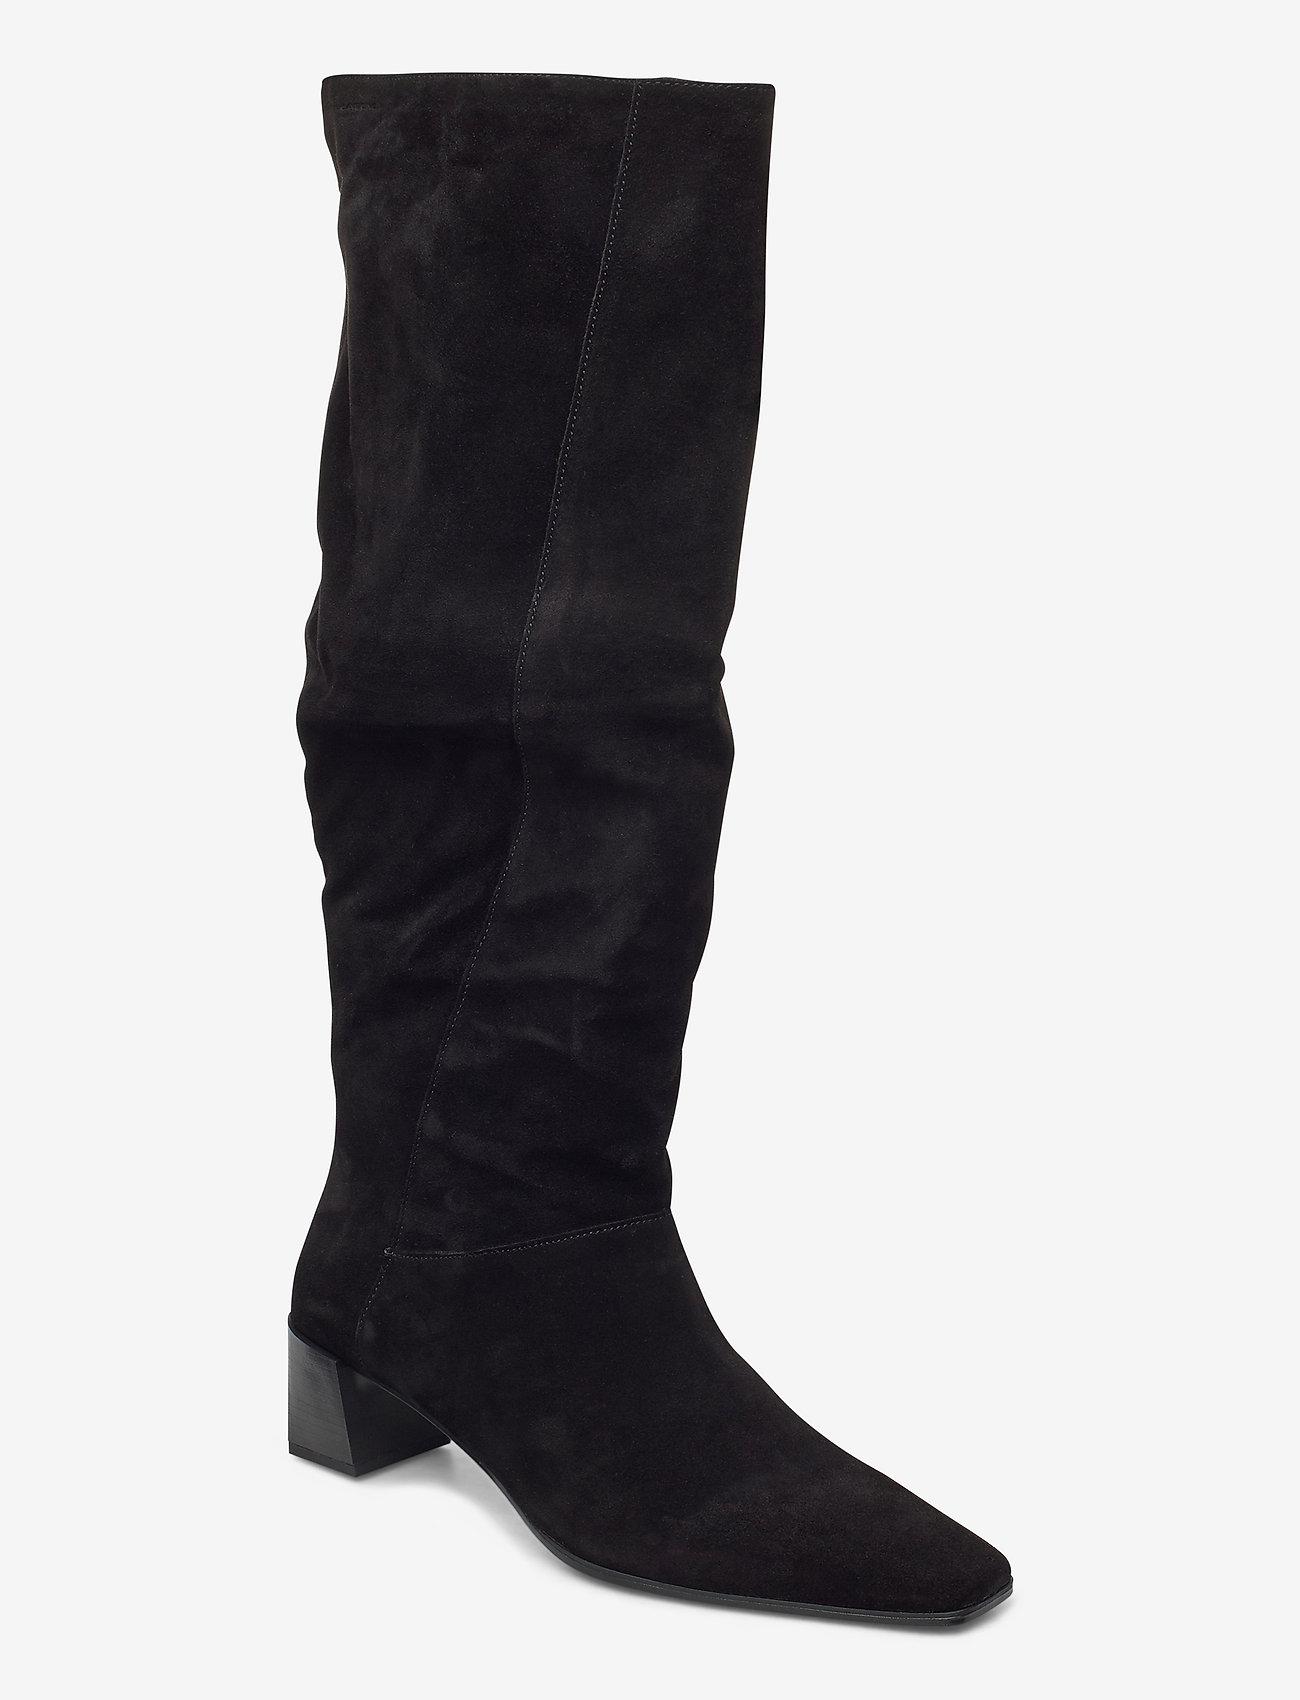 VAGABOND - GABI - lange laarzen - black - 0